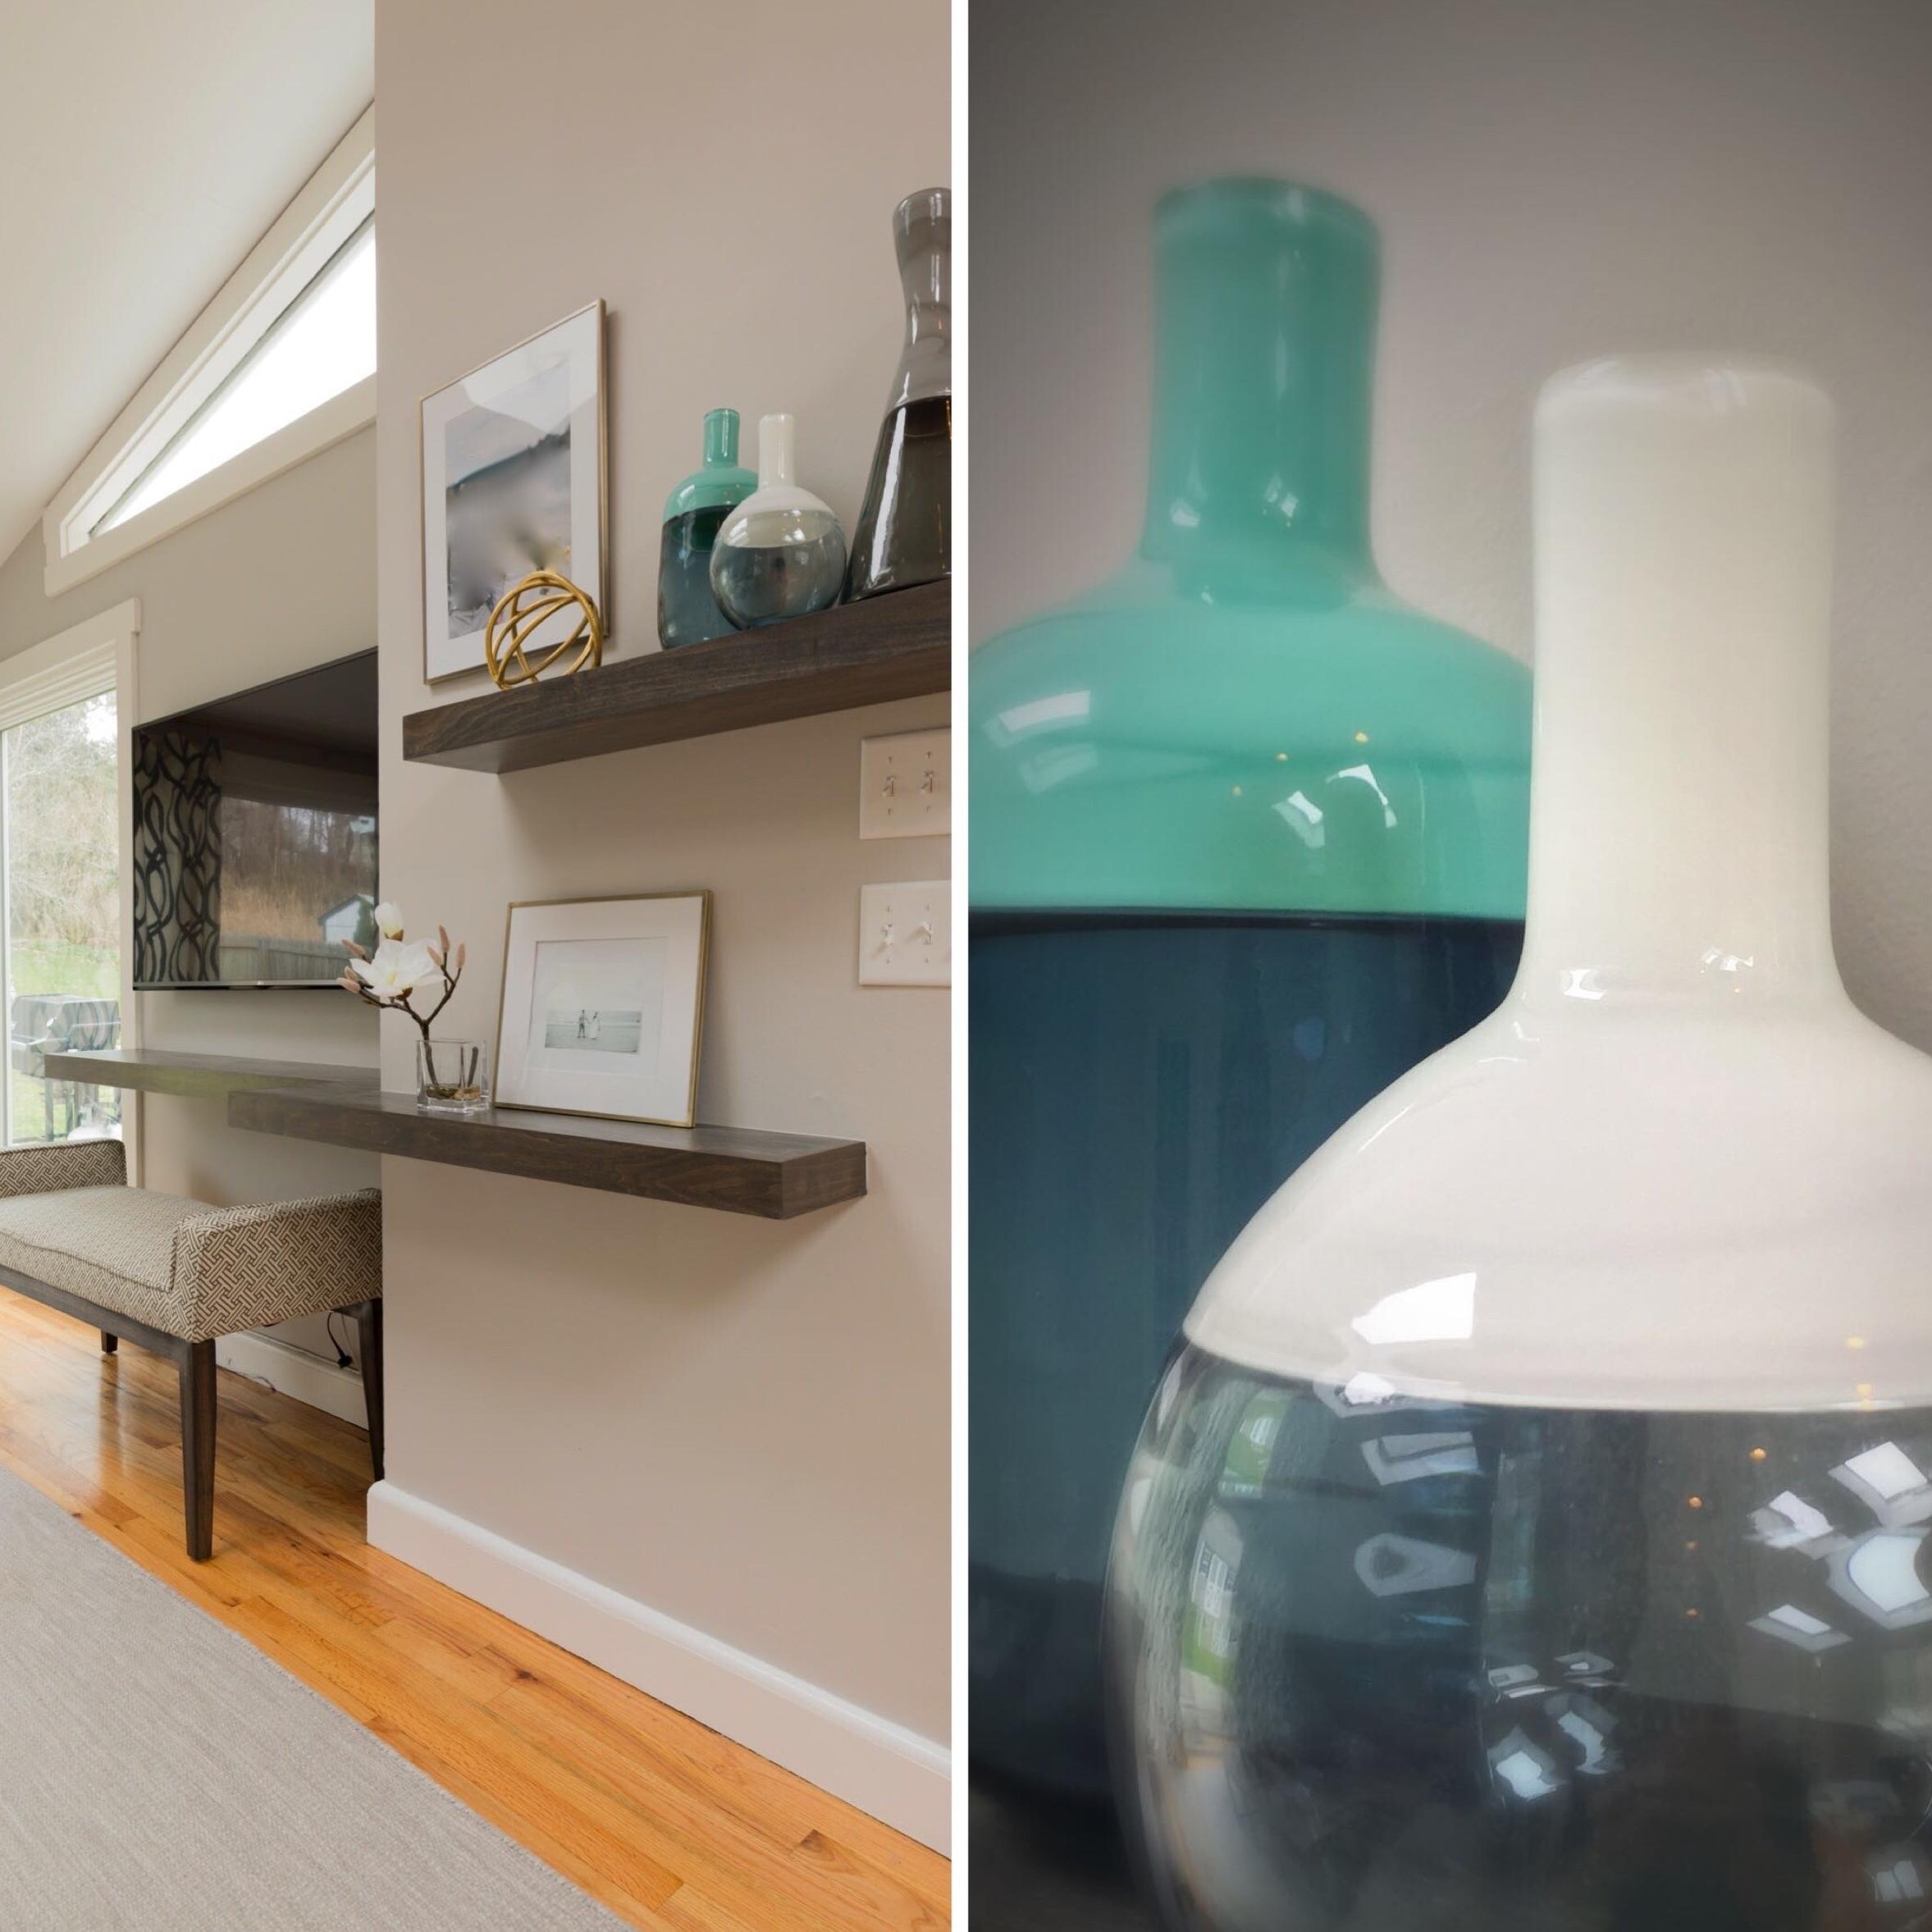 Southport Coastal Chic shelves vases